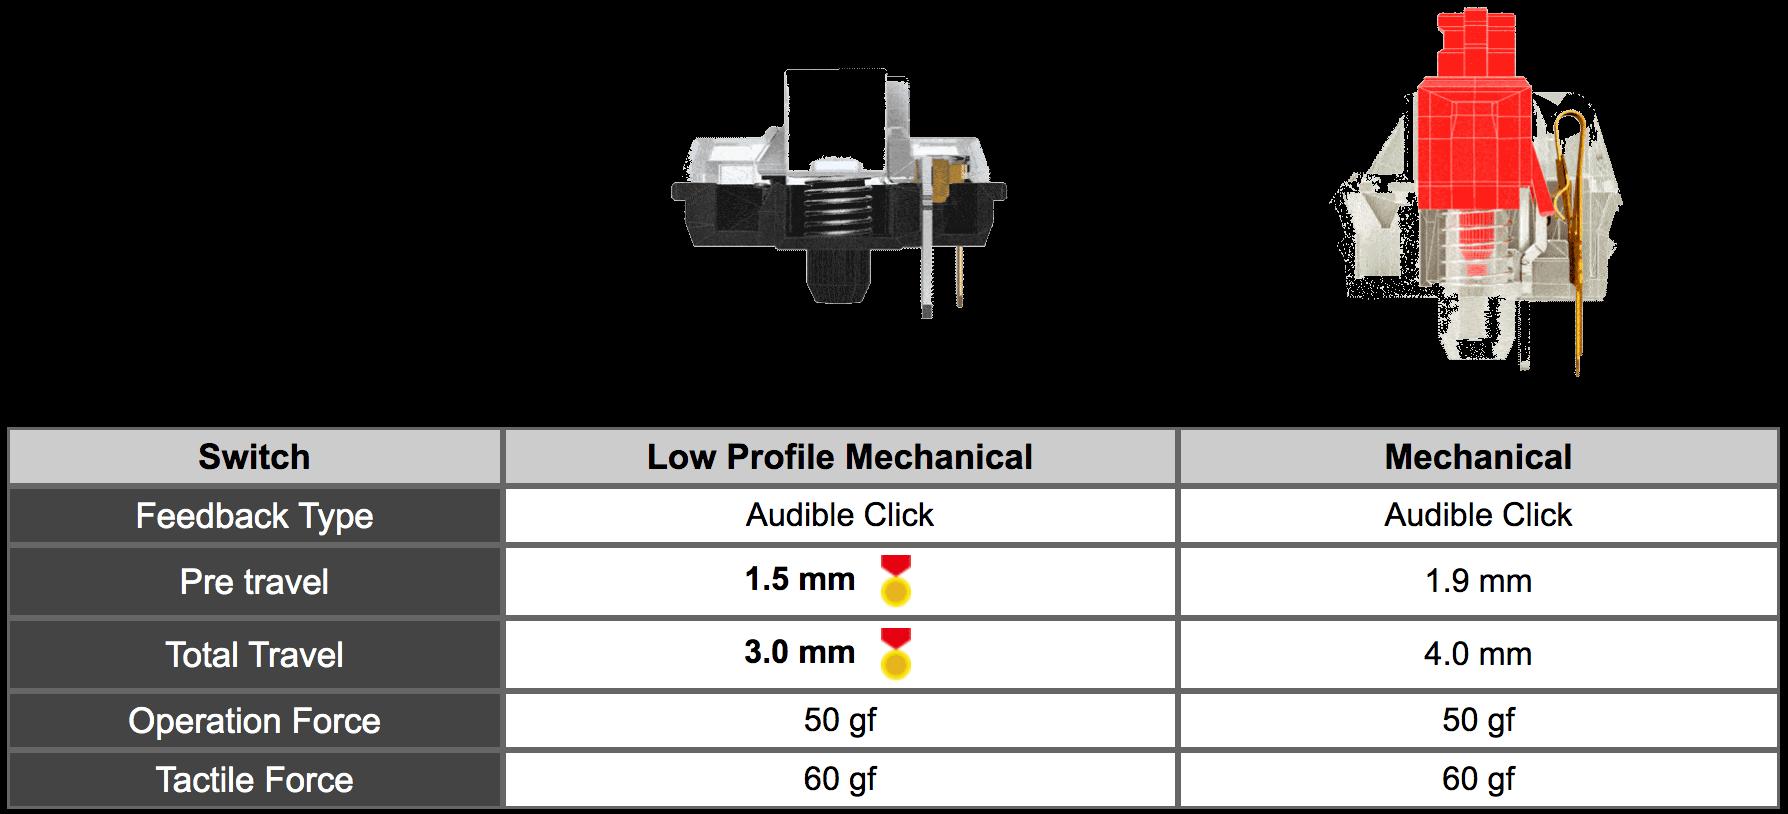 Low profile mechanical